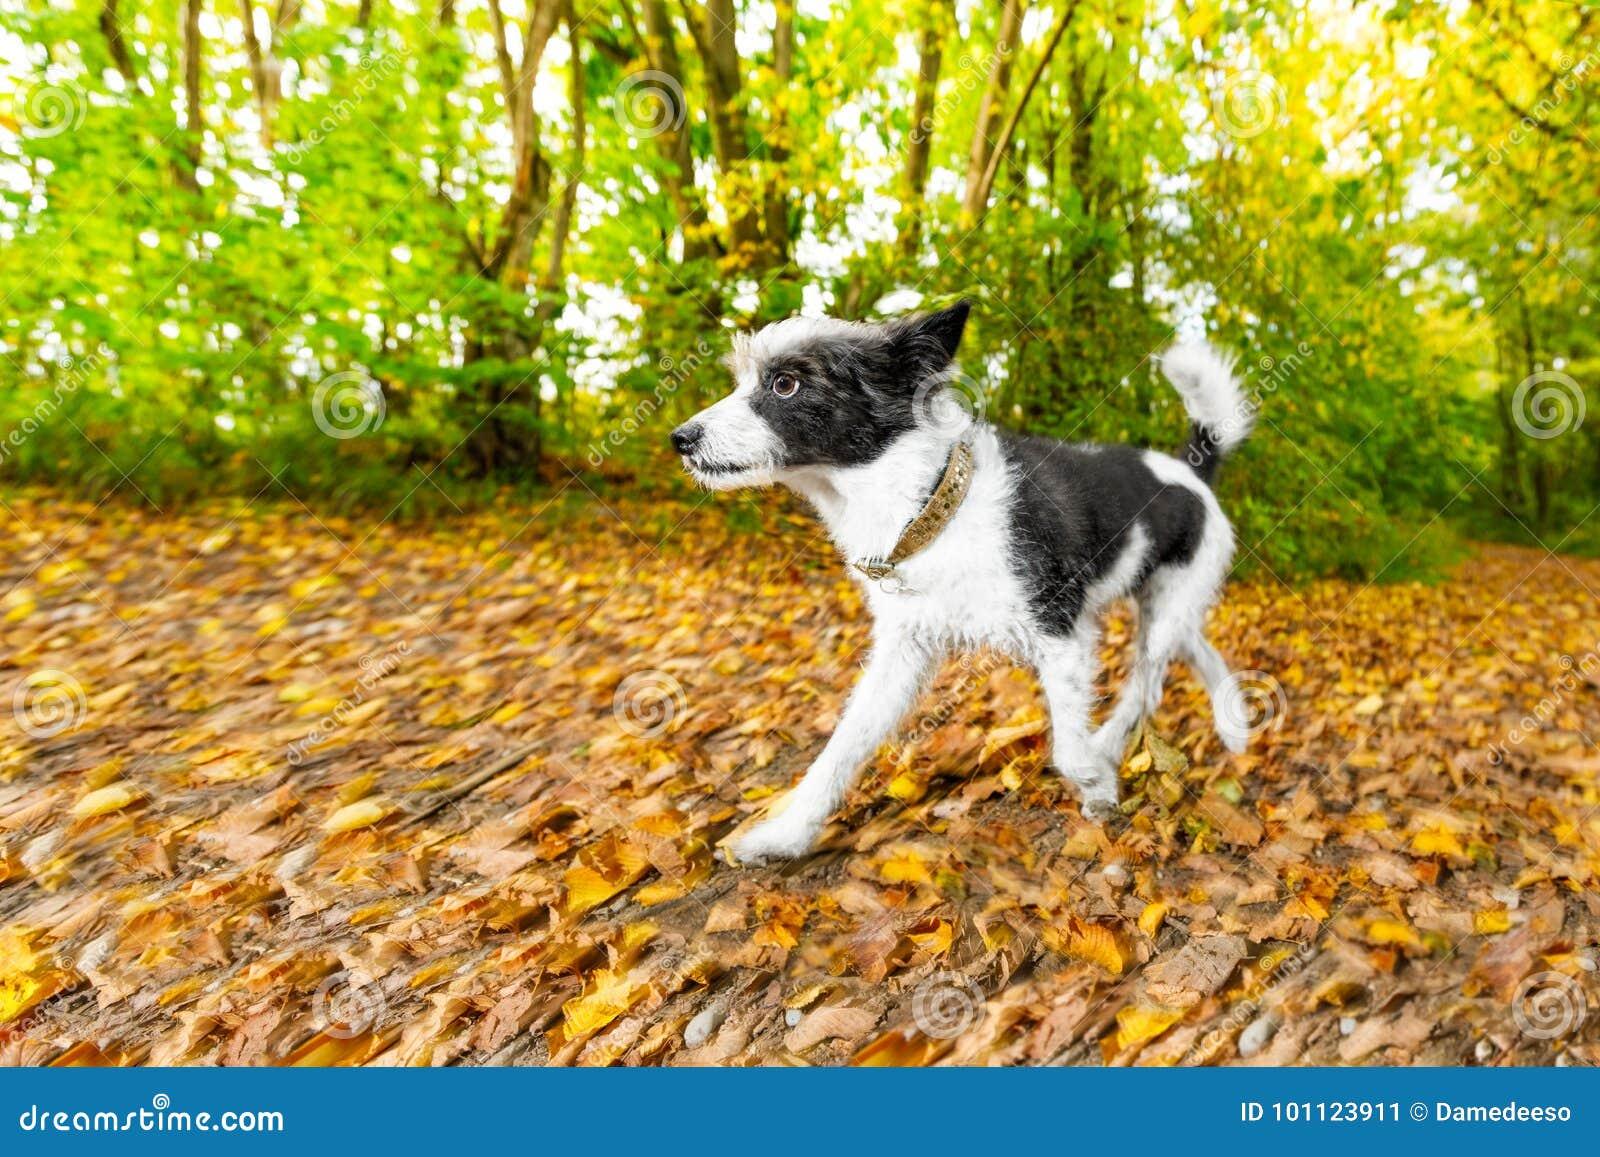 Dog running or walking in autumn